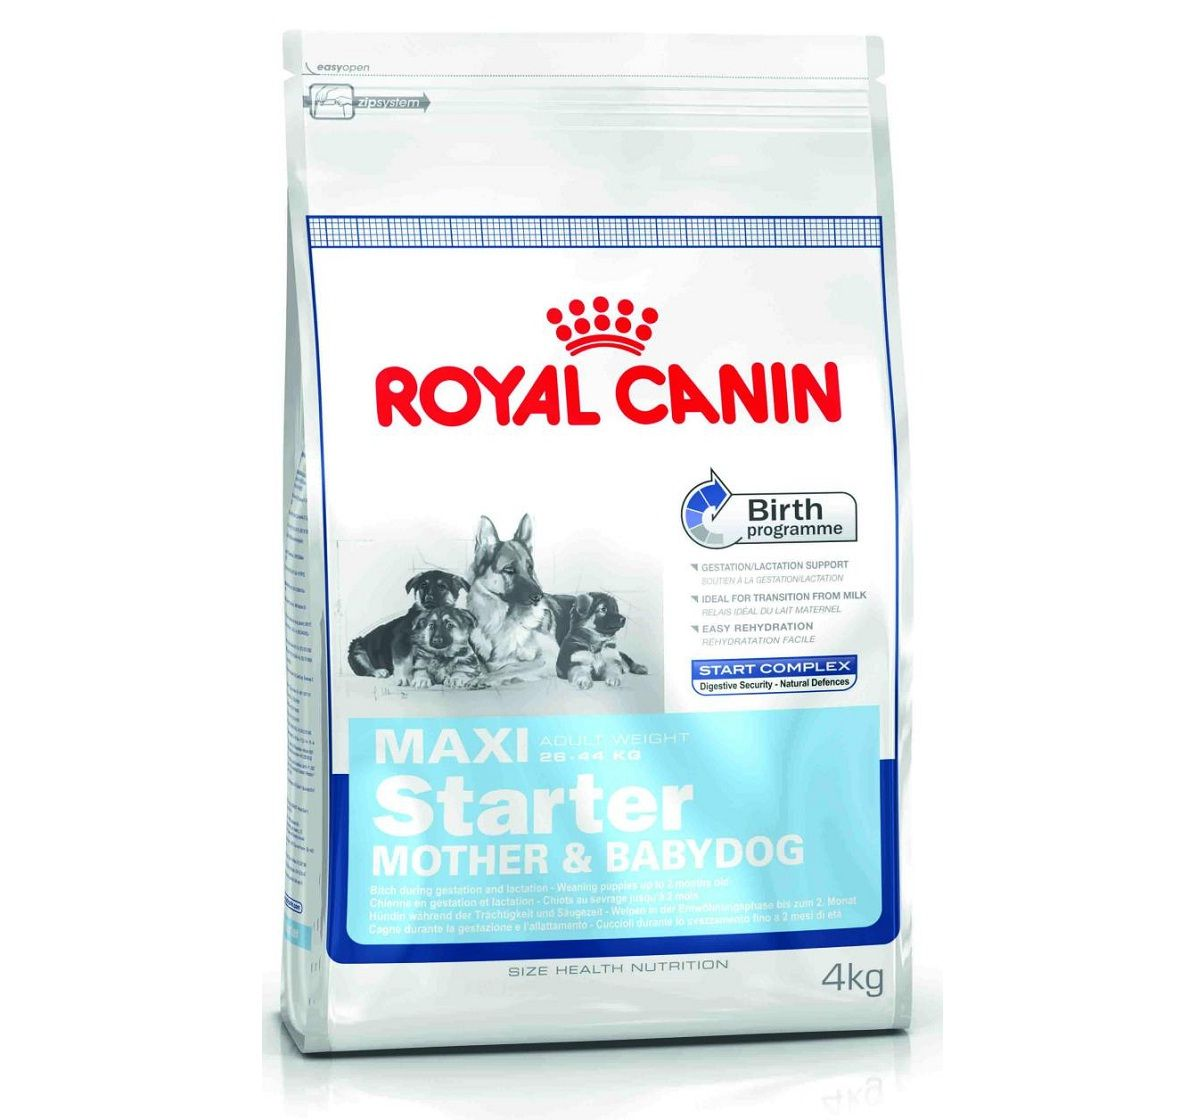 Royal Canin Maxi Starter 4 Kg Large breed dog food